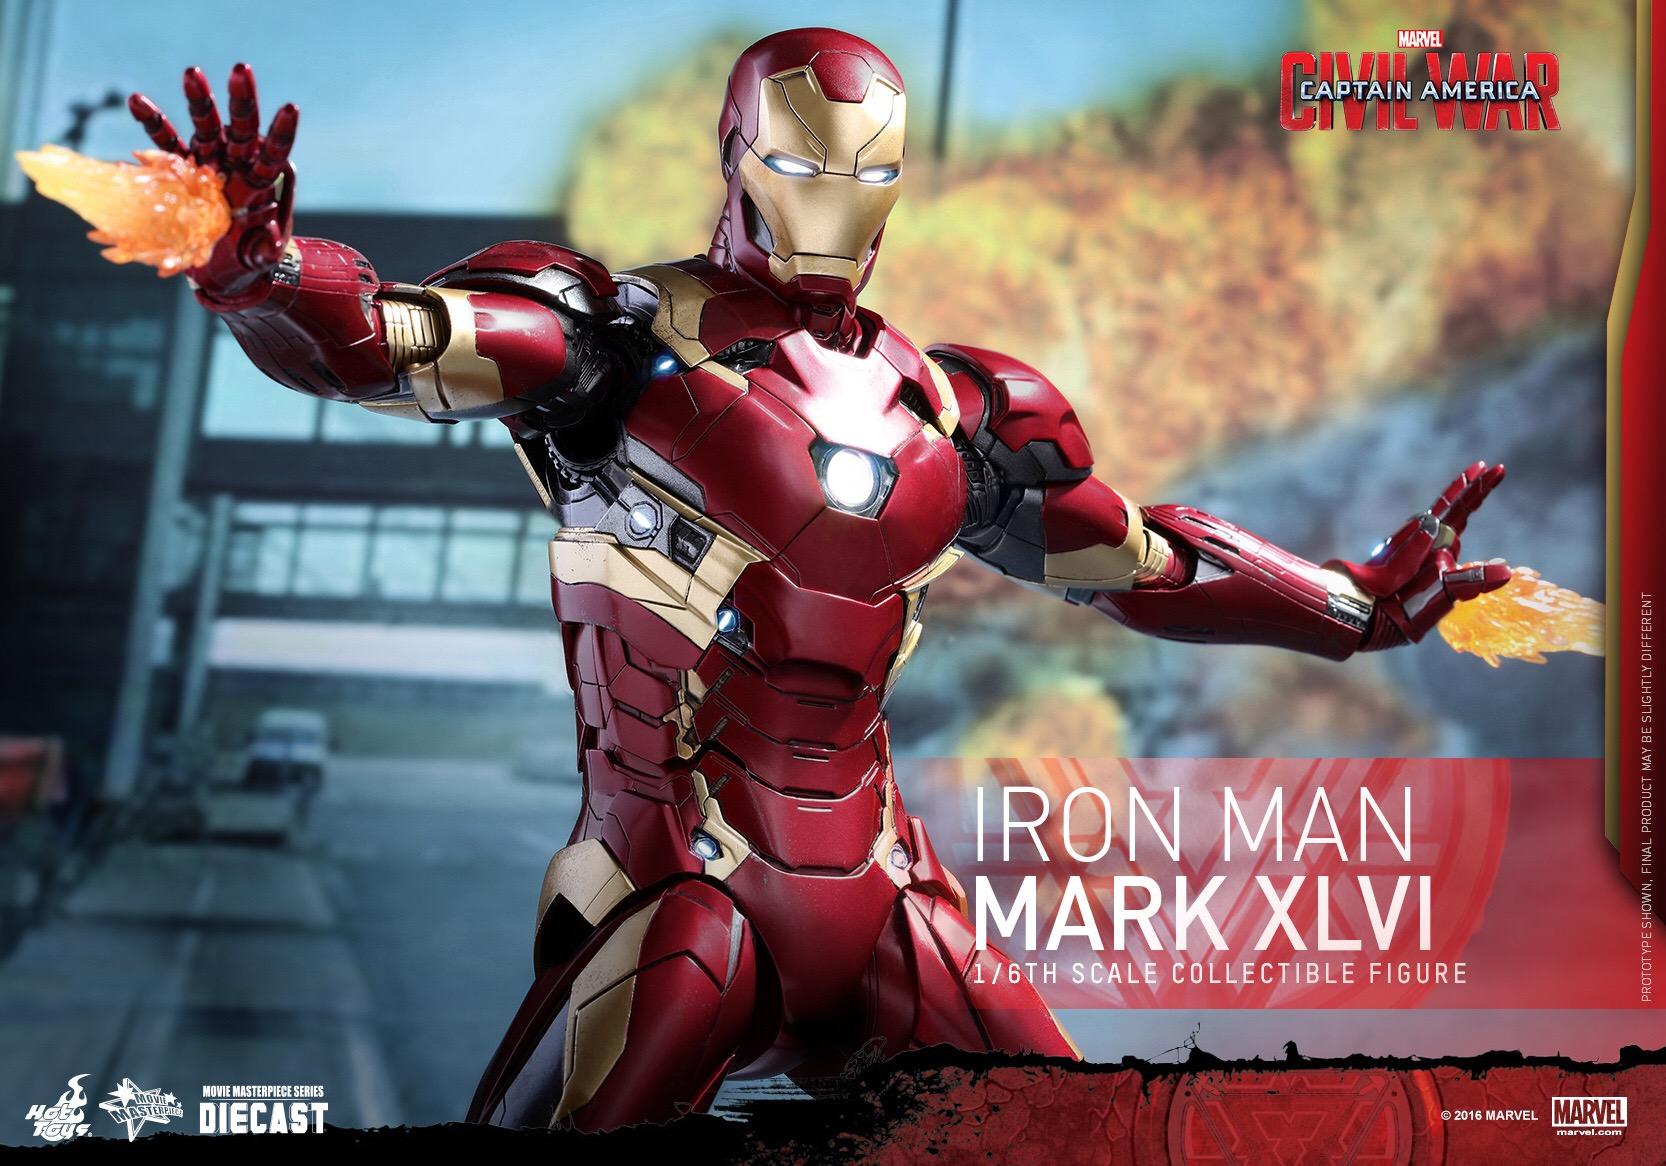 CAPTAIN AMERICA : CIVIL WAR - IRON MAN MARK XLVI (MMS353DC16) 160420020903335673